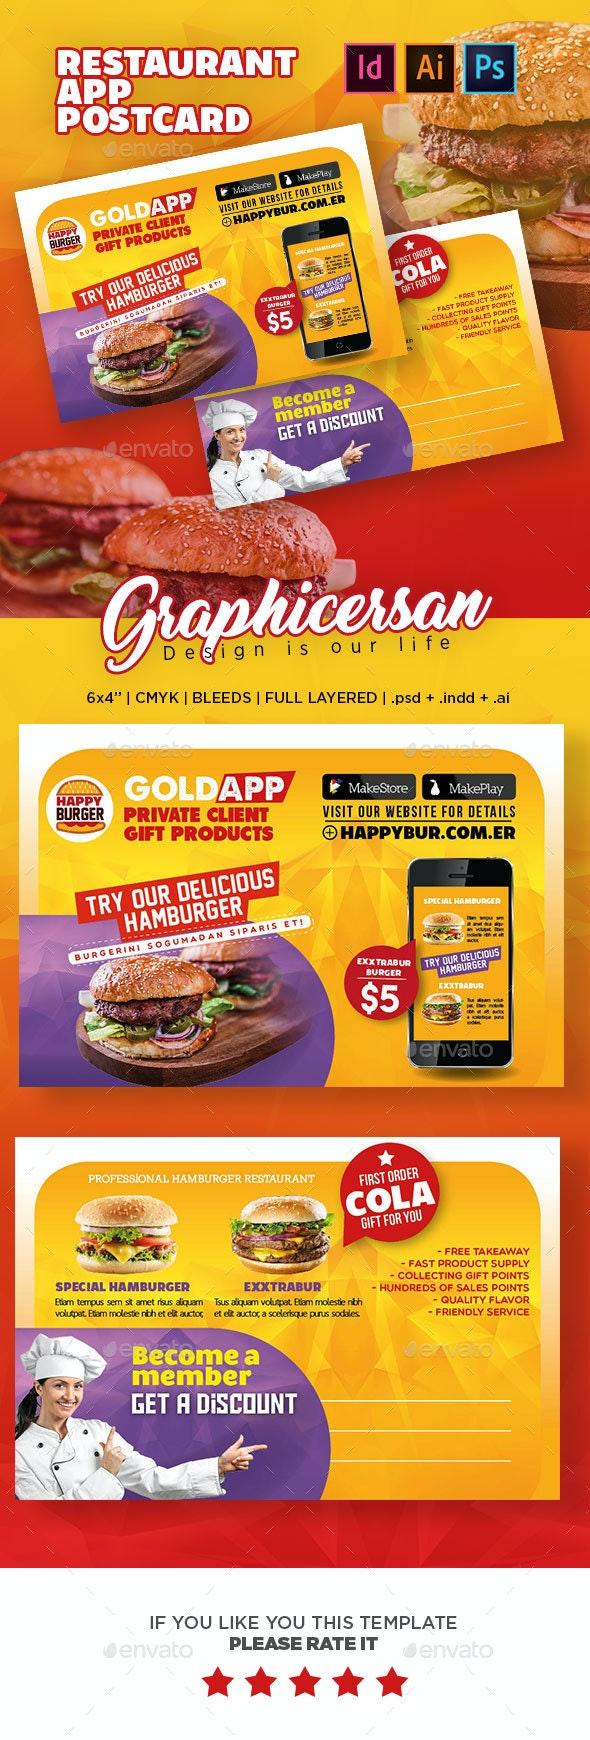 Restaurant App Postcard - Cards & Invites Print Templates